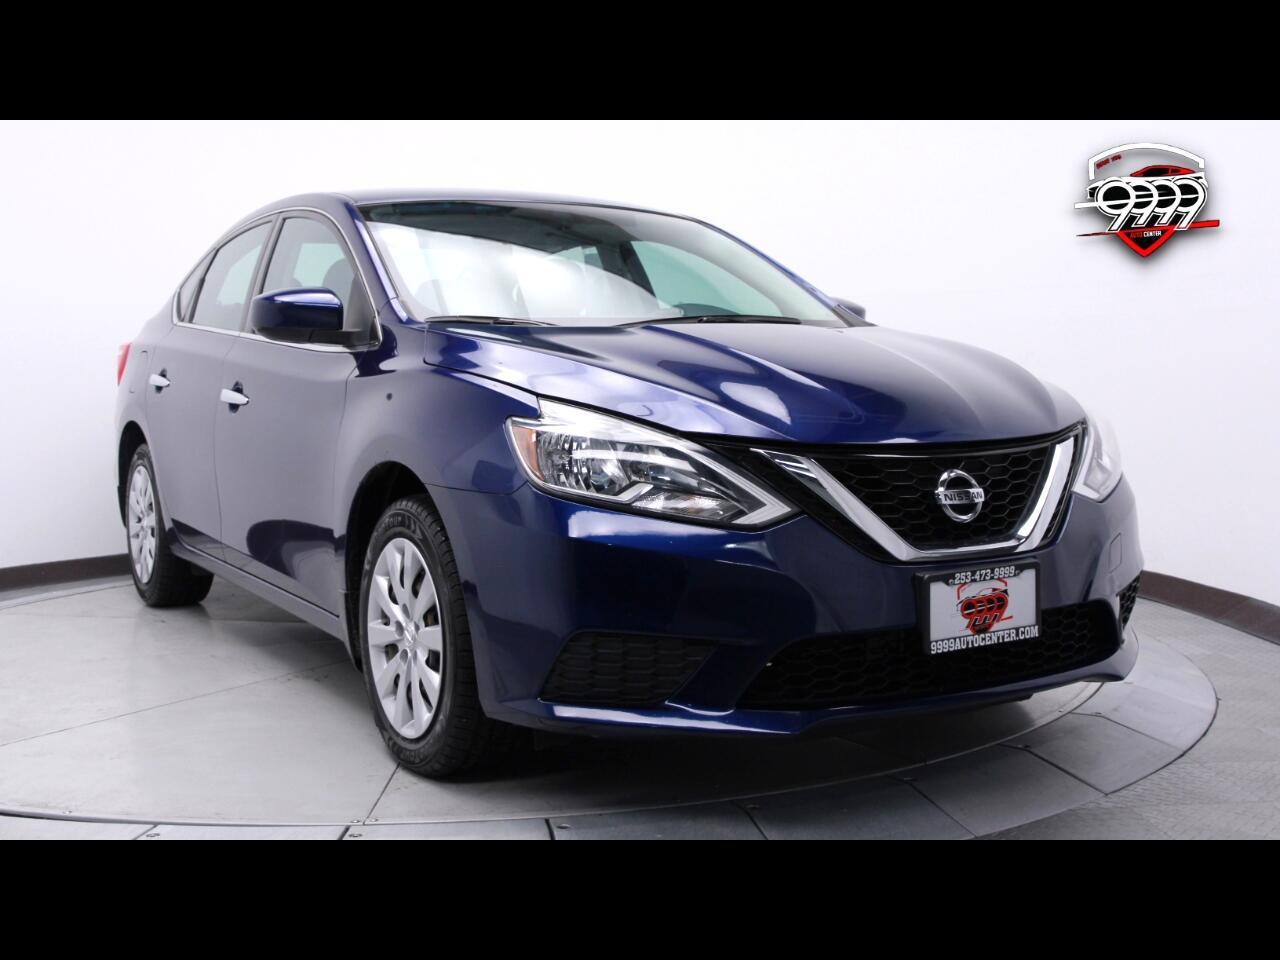 Nissan Sentra 1.8 S 2017